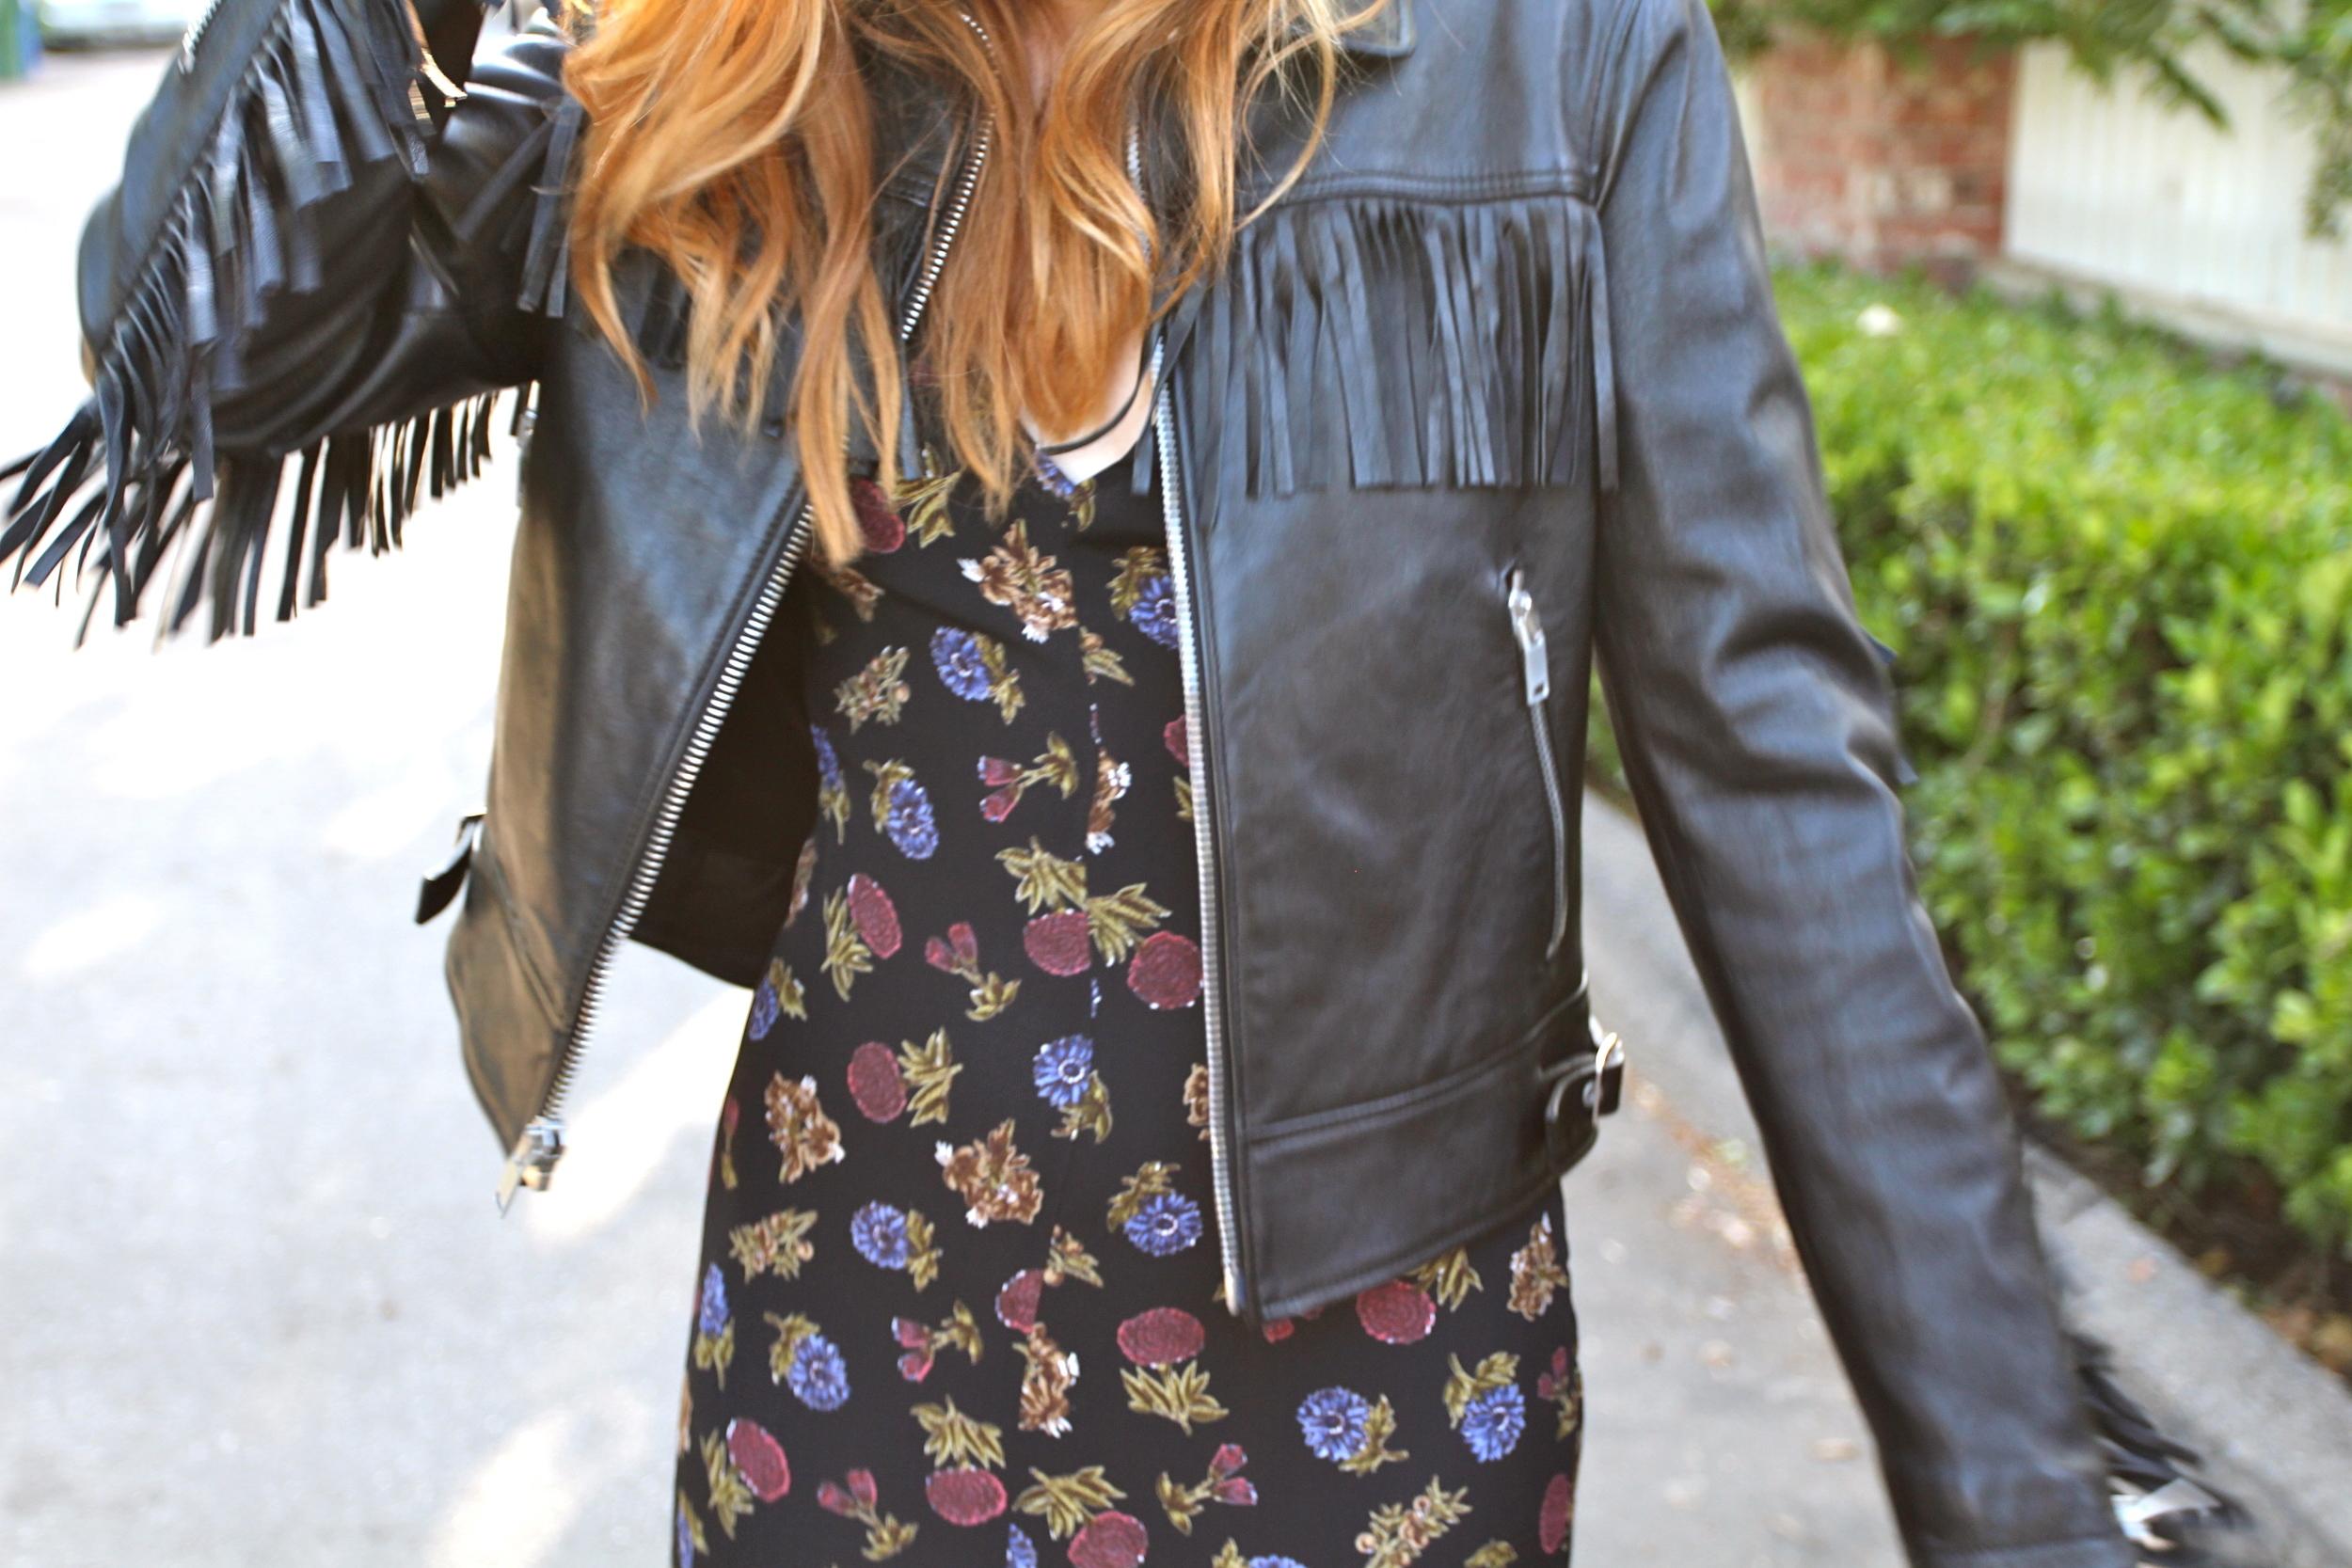 Dress - Reformation | Jacket -  Saint Laurent  | Boots -  Jeffrey Campbell  || photos by Sarah Hardcastle